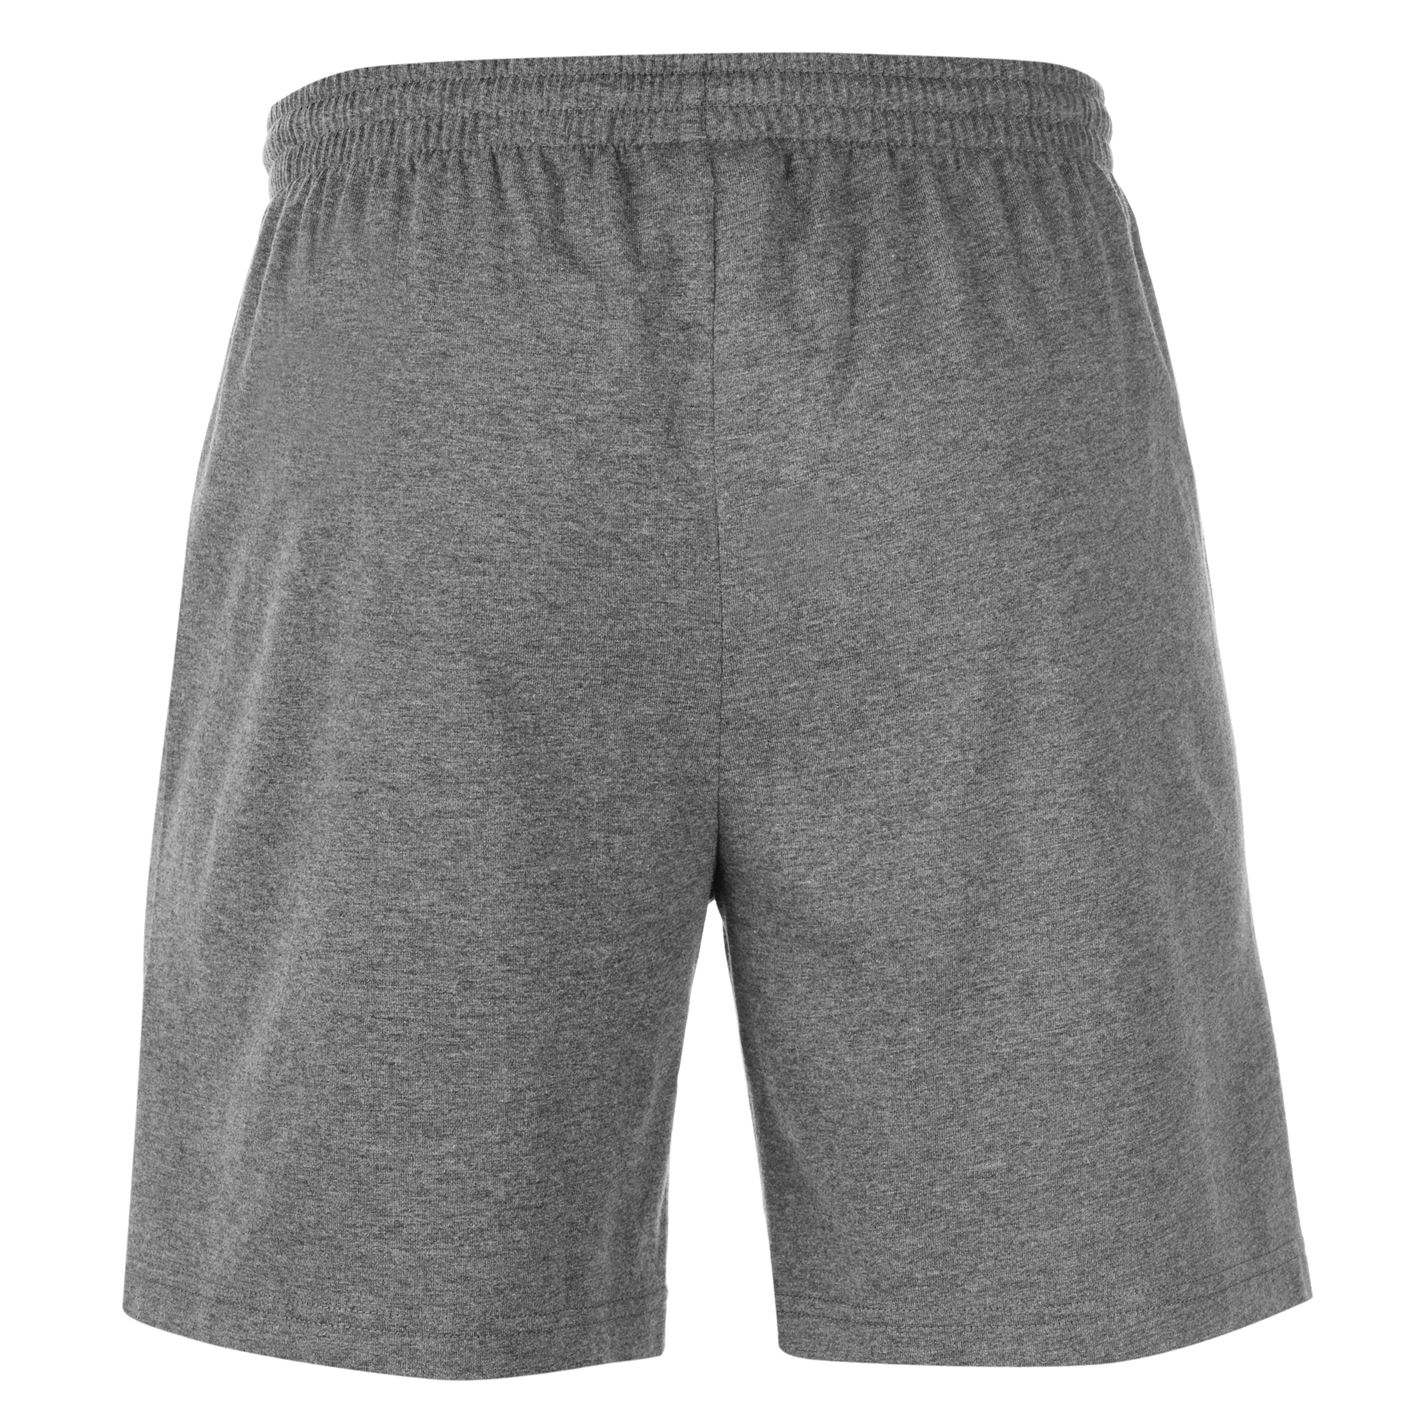 88779bc3777 Slazenger Mens Jersey Shorts Pants Trousers Bottoms Elasticated ...